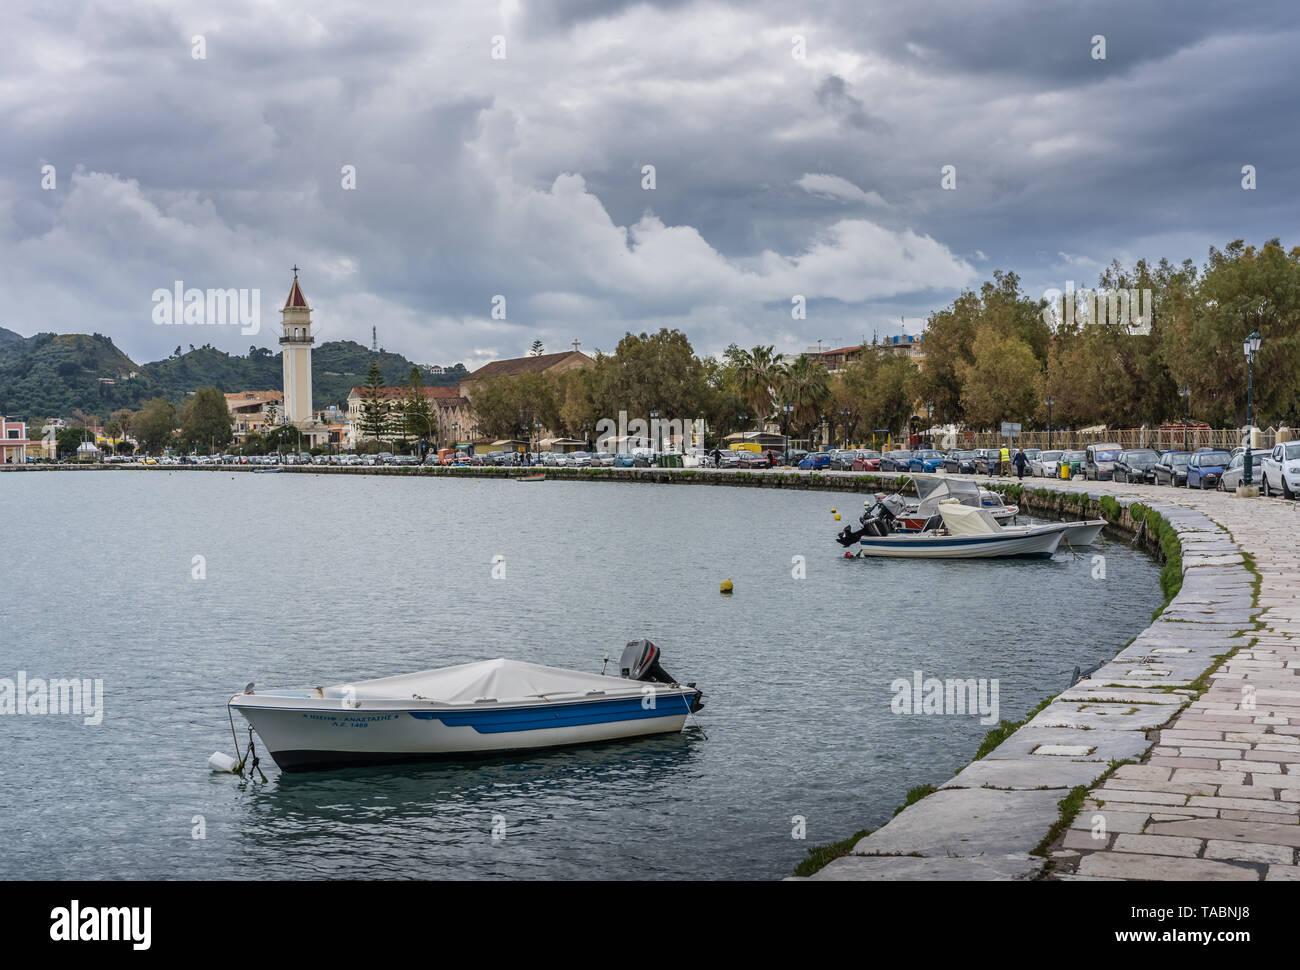 Zakynthos, Greece -  April 2019 : Boats moored on the shore in Zakynthos Port, Ionian islands - Stock Image